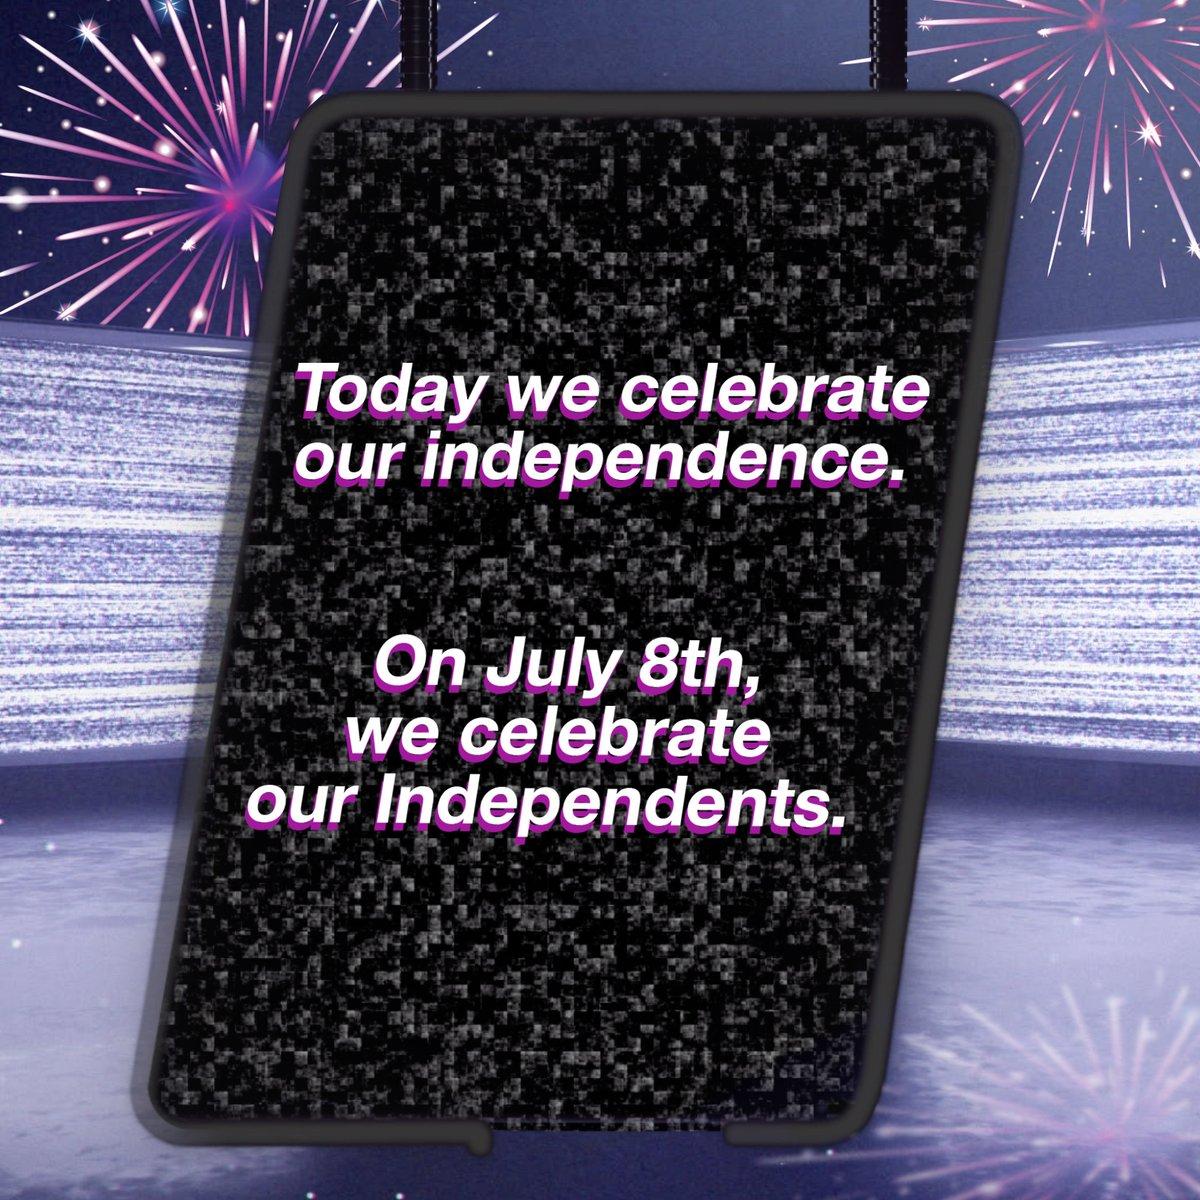 Dare we say July 8th could also be revolutionary?  #rarediseaseawareness #daretothinkrare #raredisease #filmfestivals #undiagnoseddiseases #geneticresearchpic.twitter.com/ALPC30WX0i